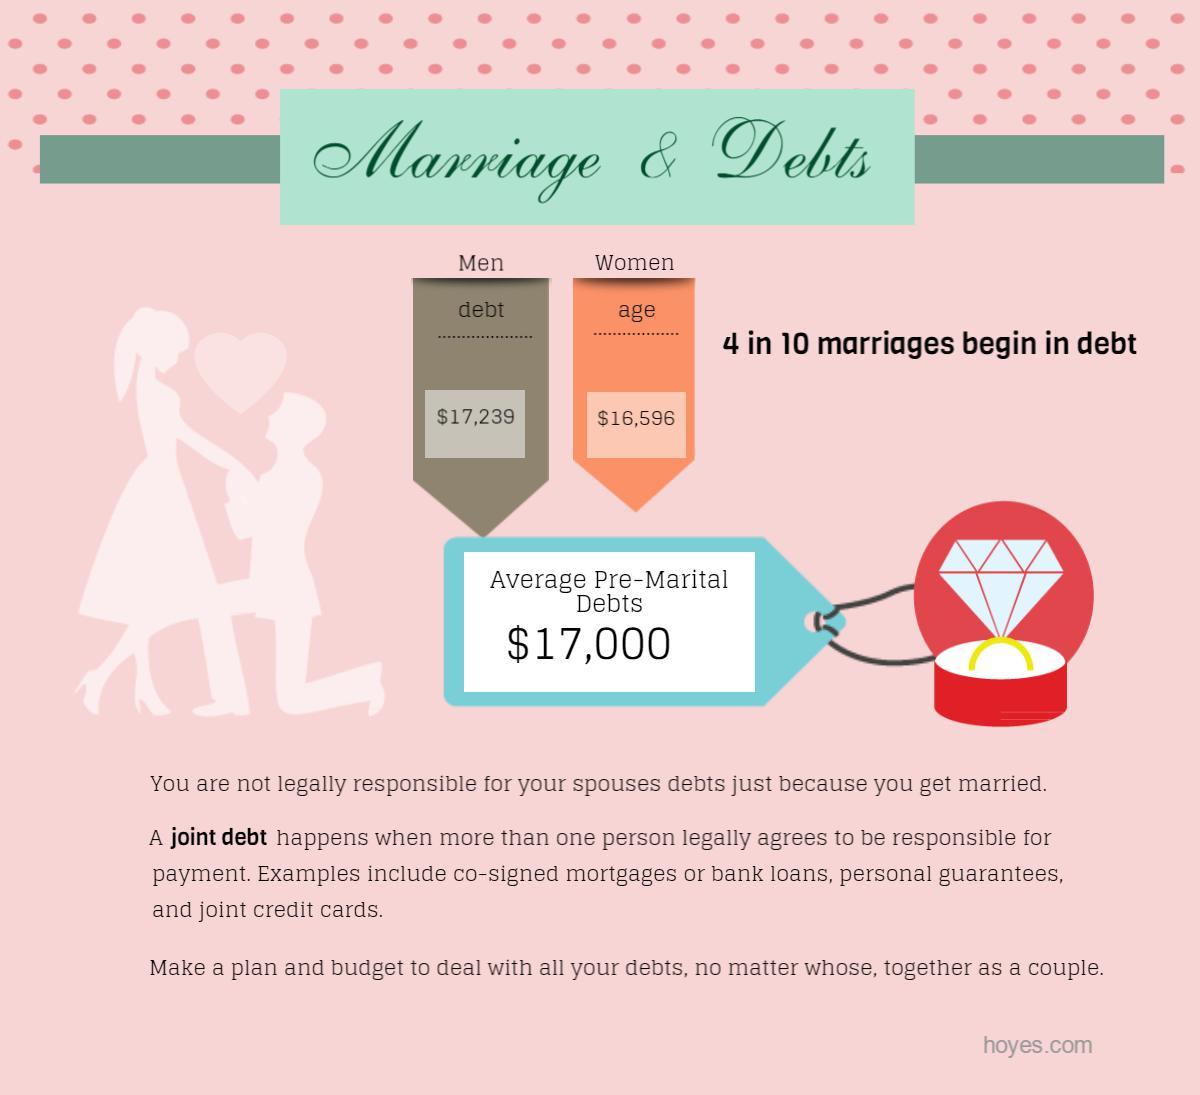 reduce debt marriage